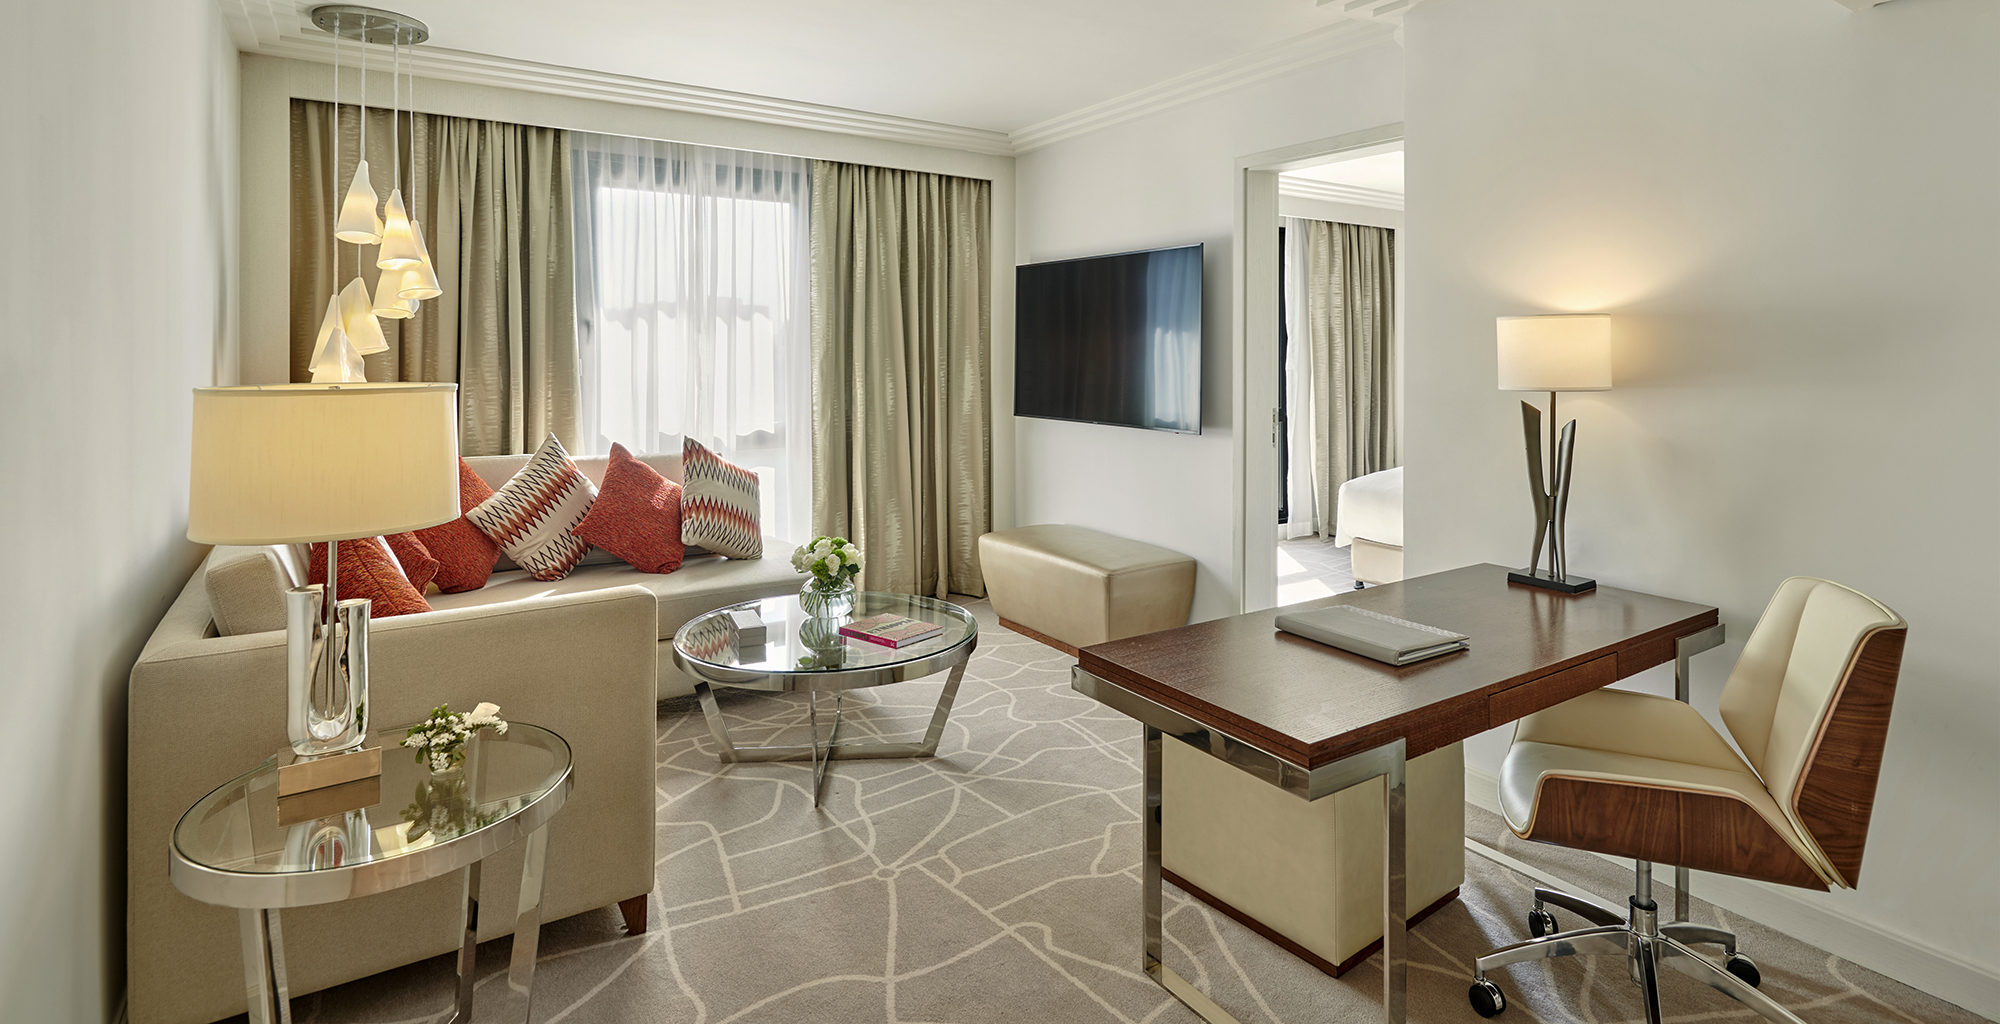 Ethiopia-Hyatt-Regency-Addis-Ababa-Living-Room